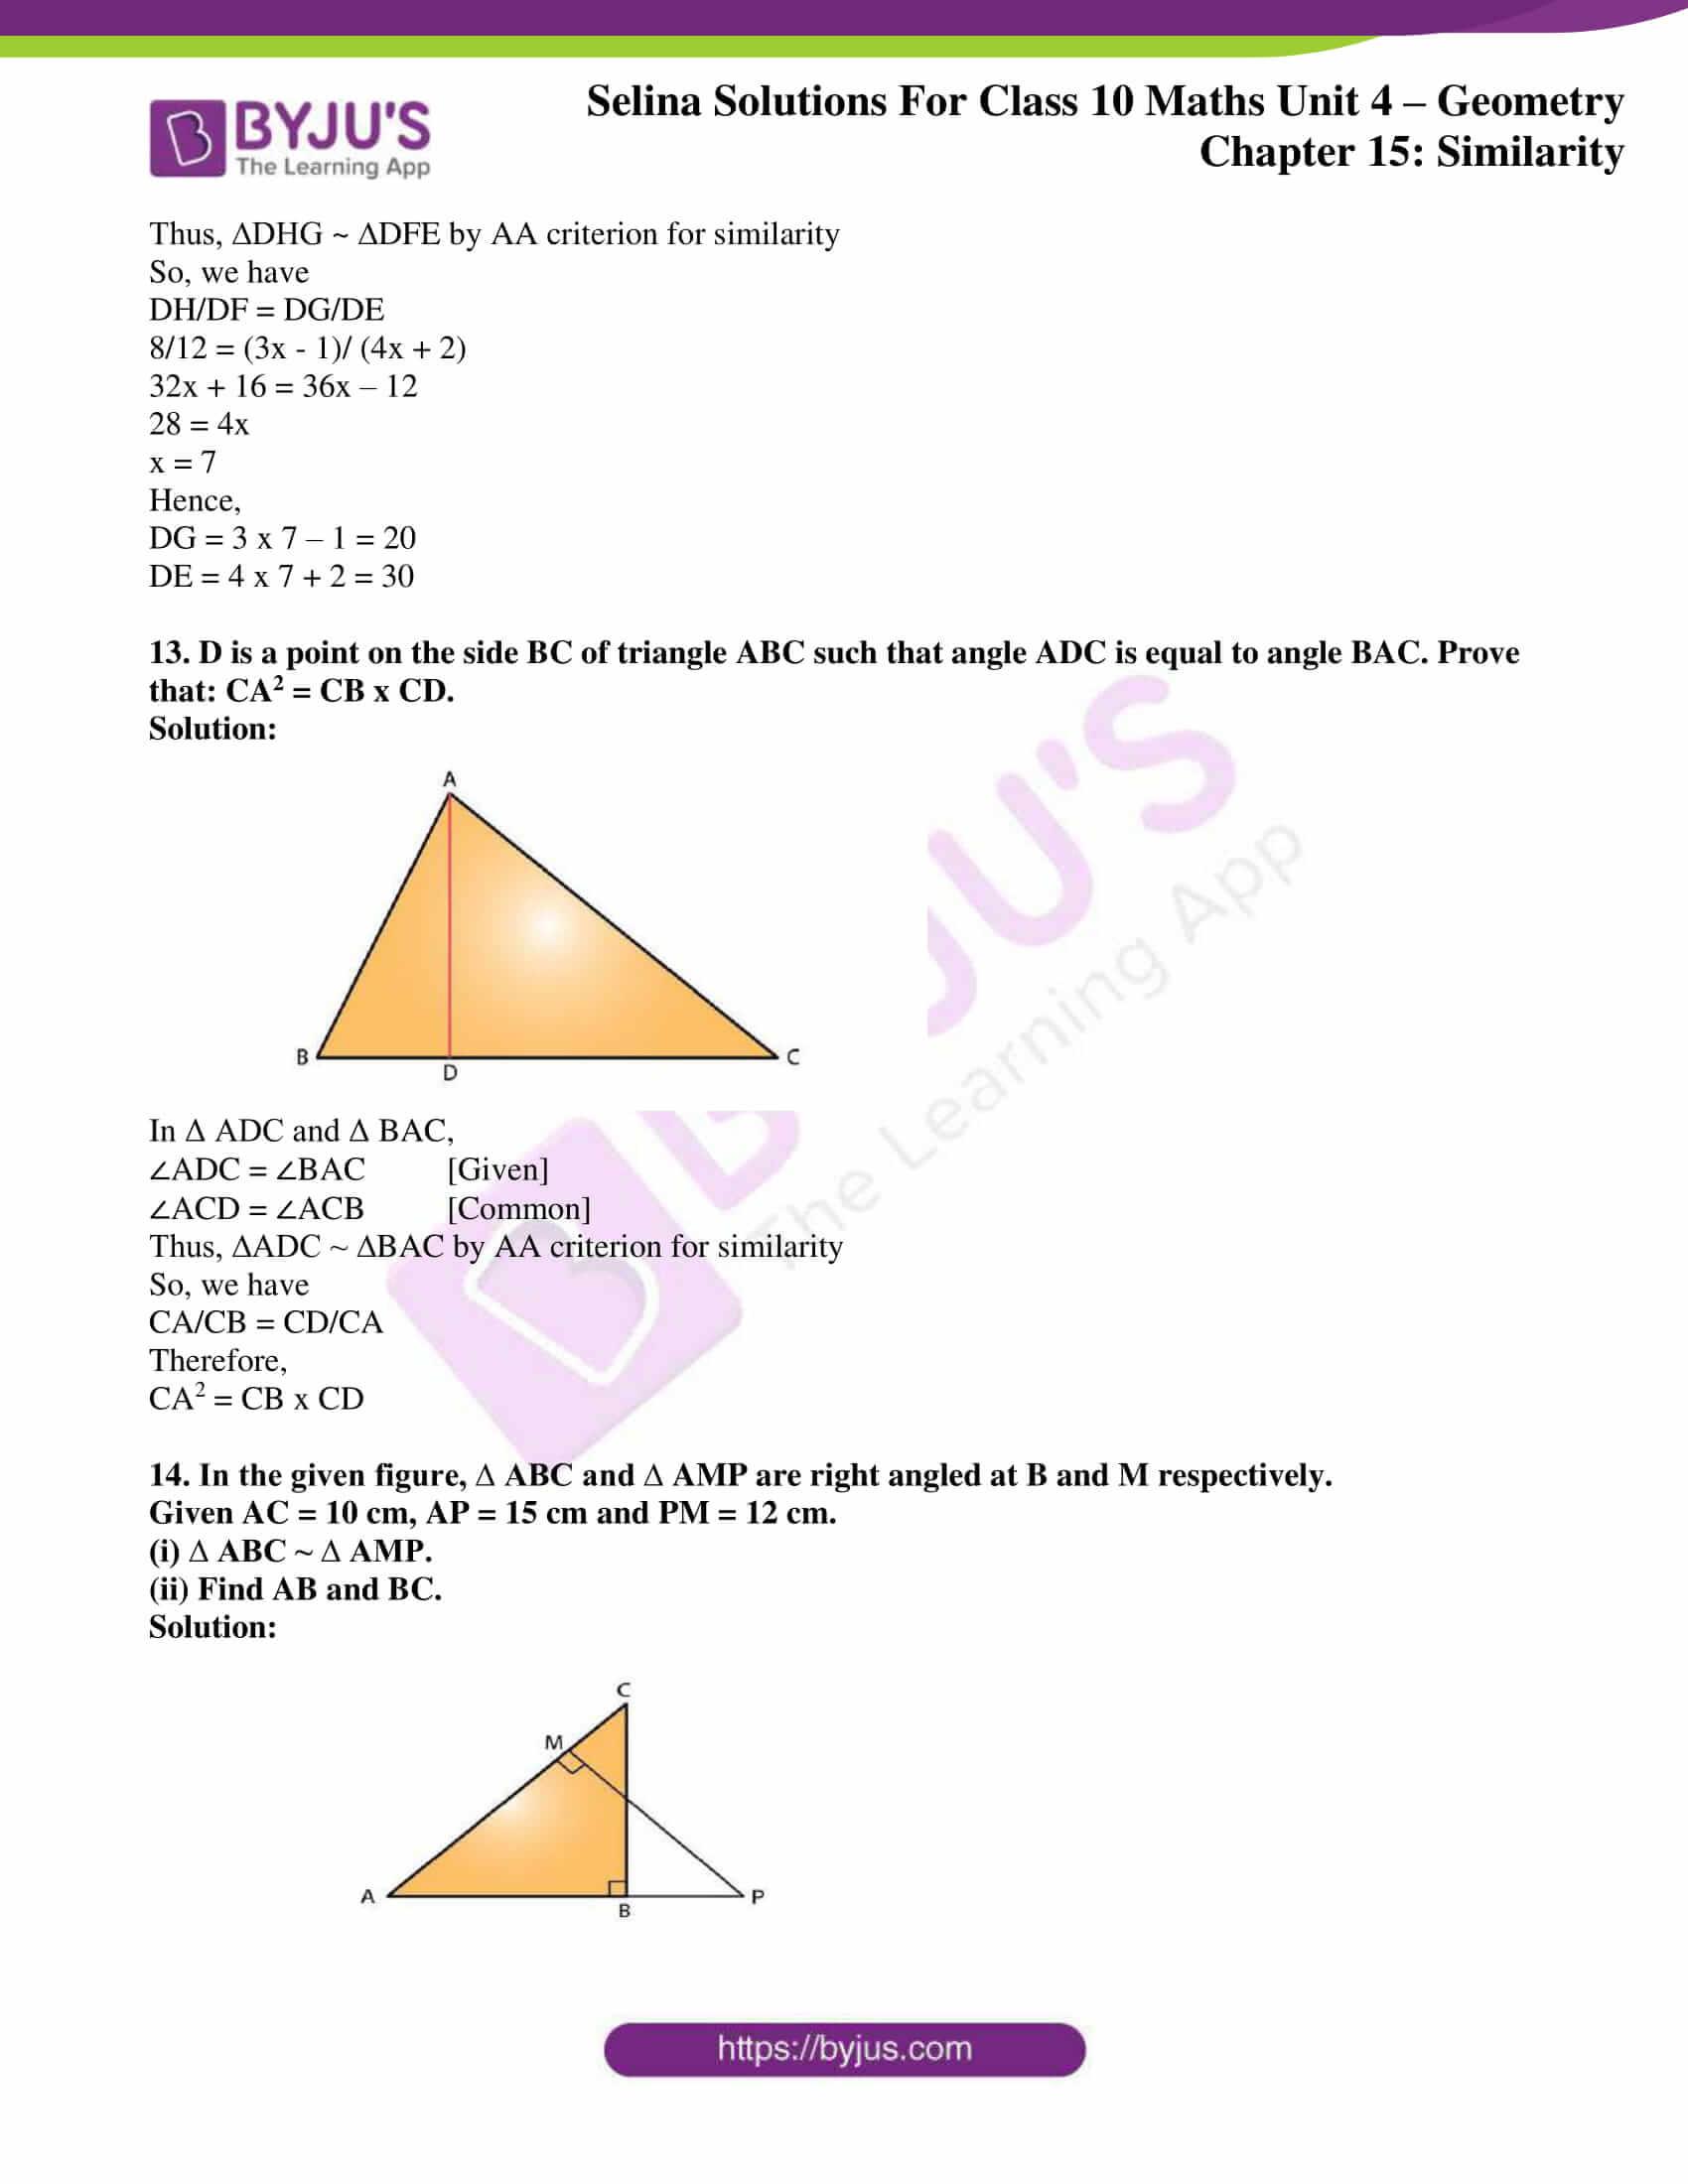 selina-sol-maths-class-10-ch-15-ex-a-8